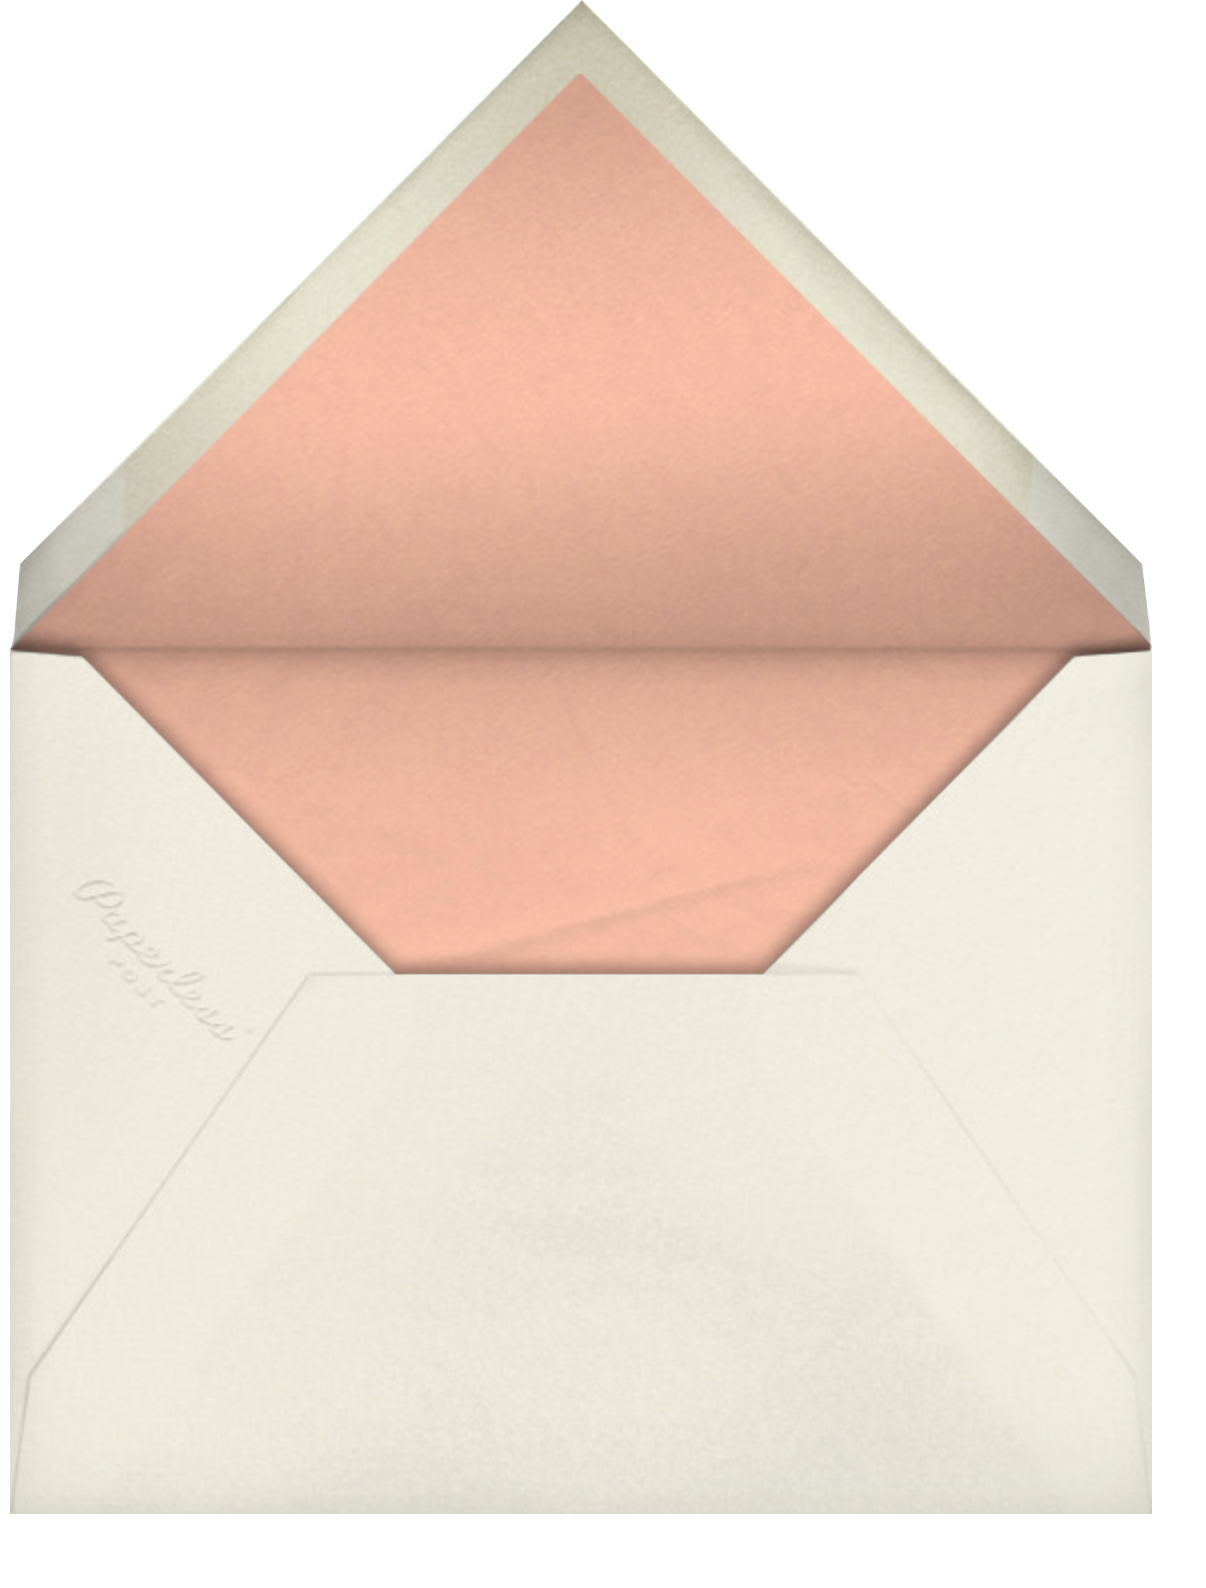 Rose Chintz - Anthropologie - Graduation thank you cards - envelope back